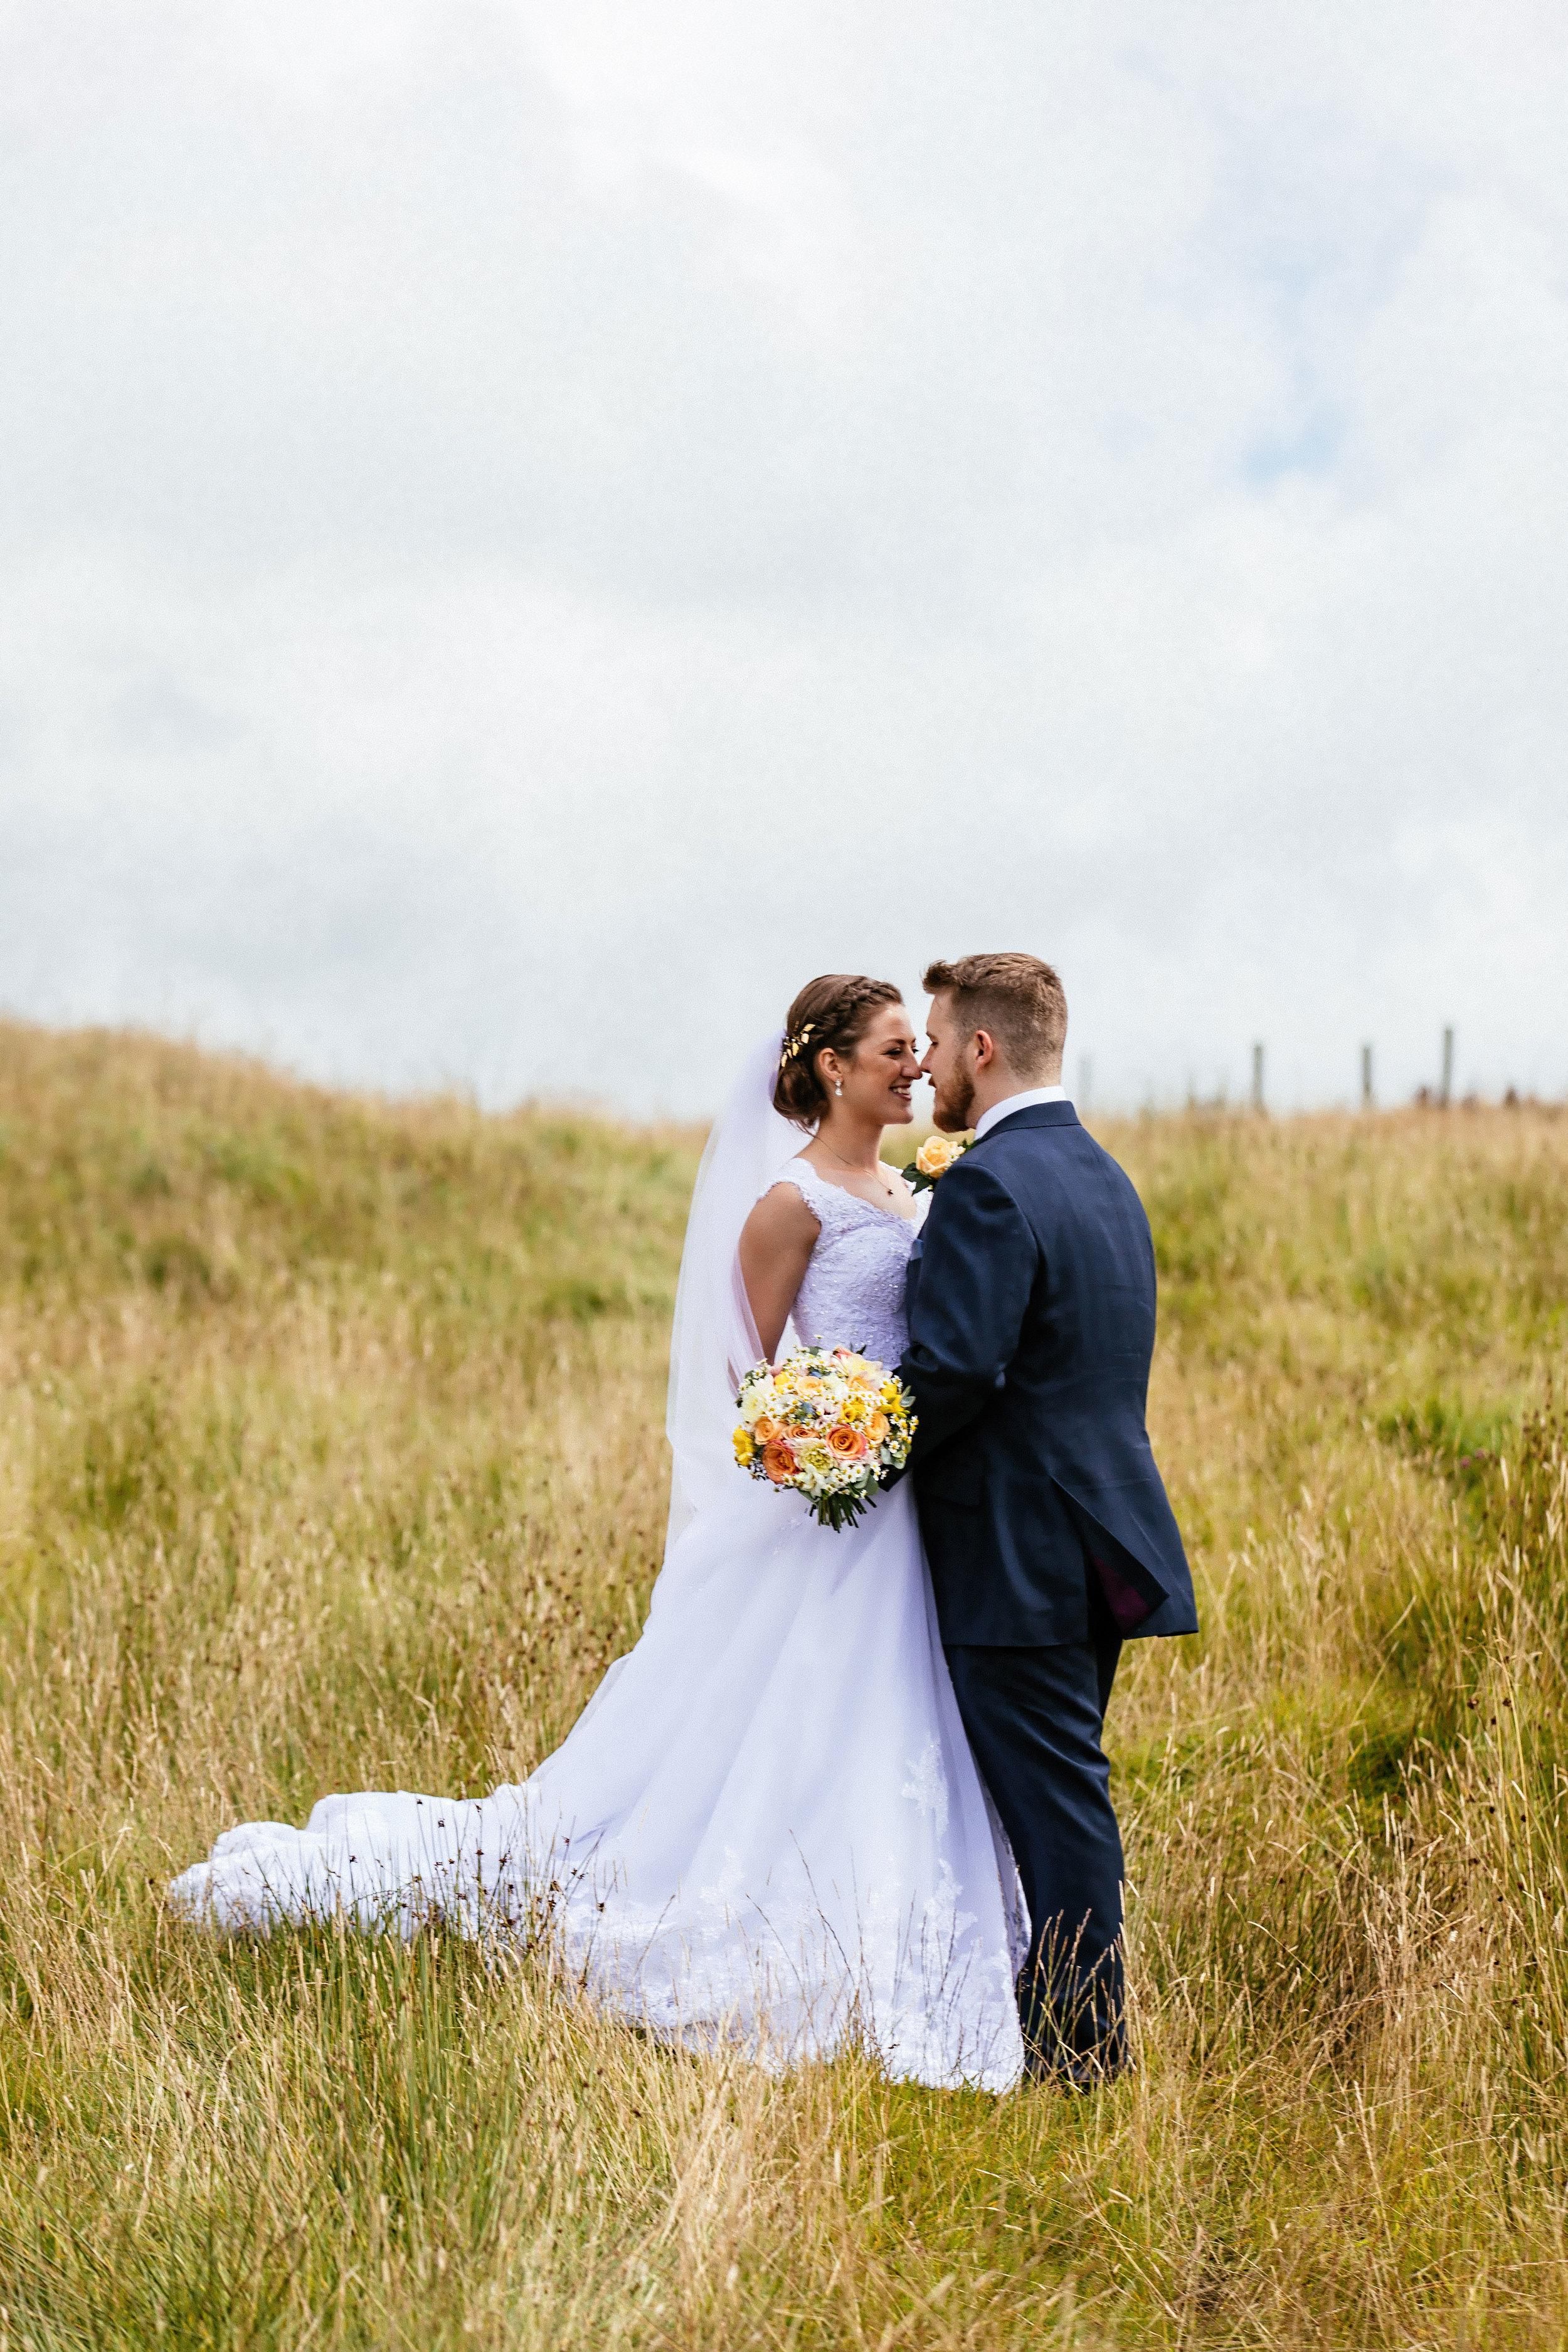 Kathryn-and-Mike-Wedding-Highlights-71.jpg